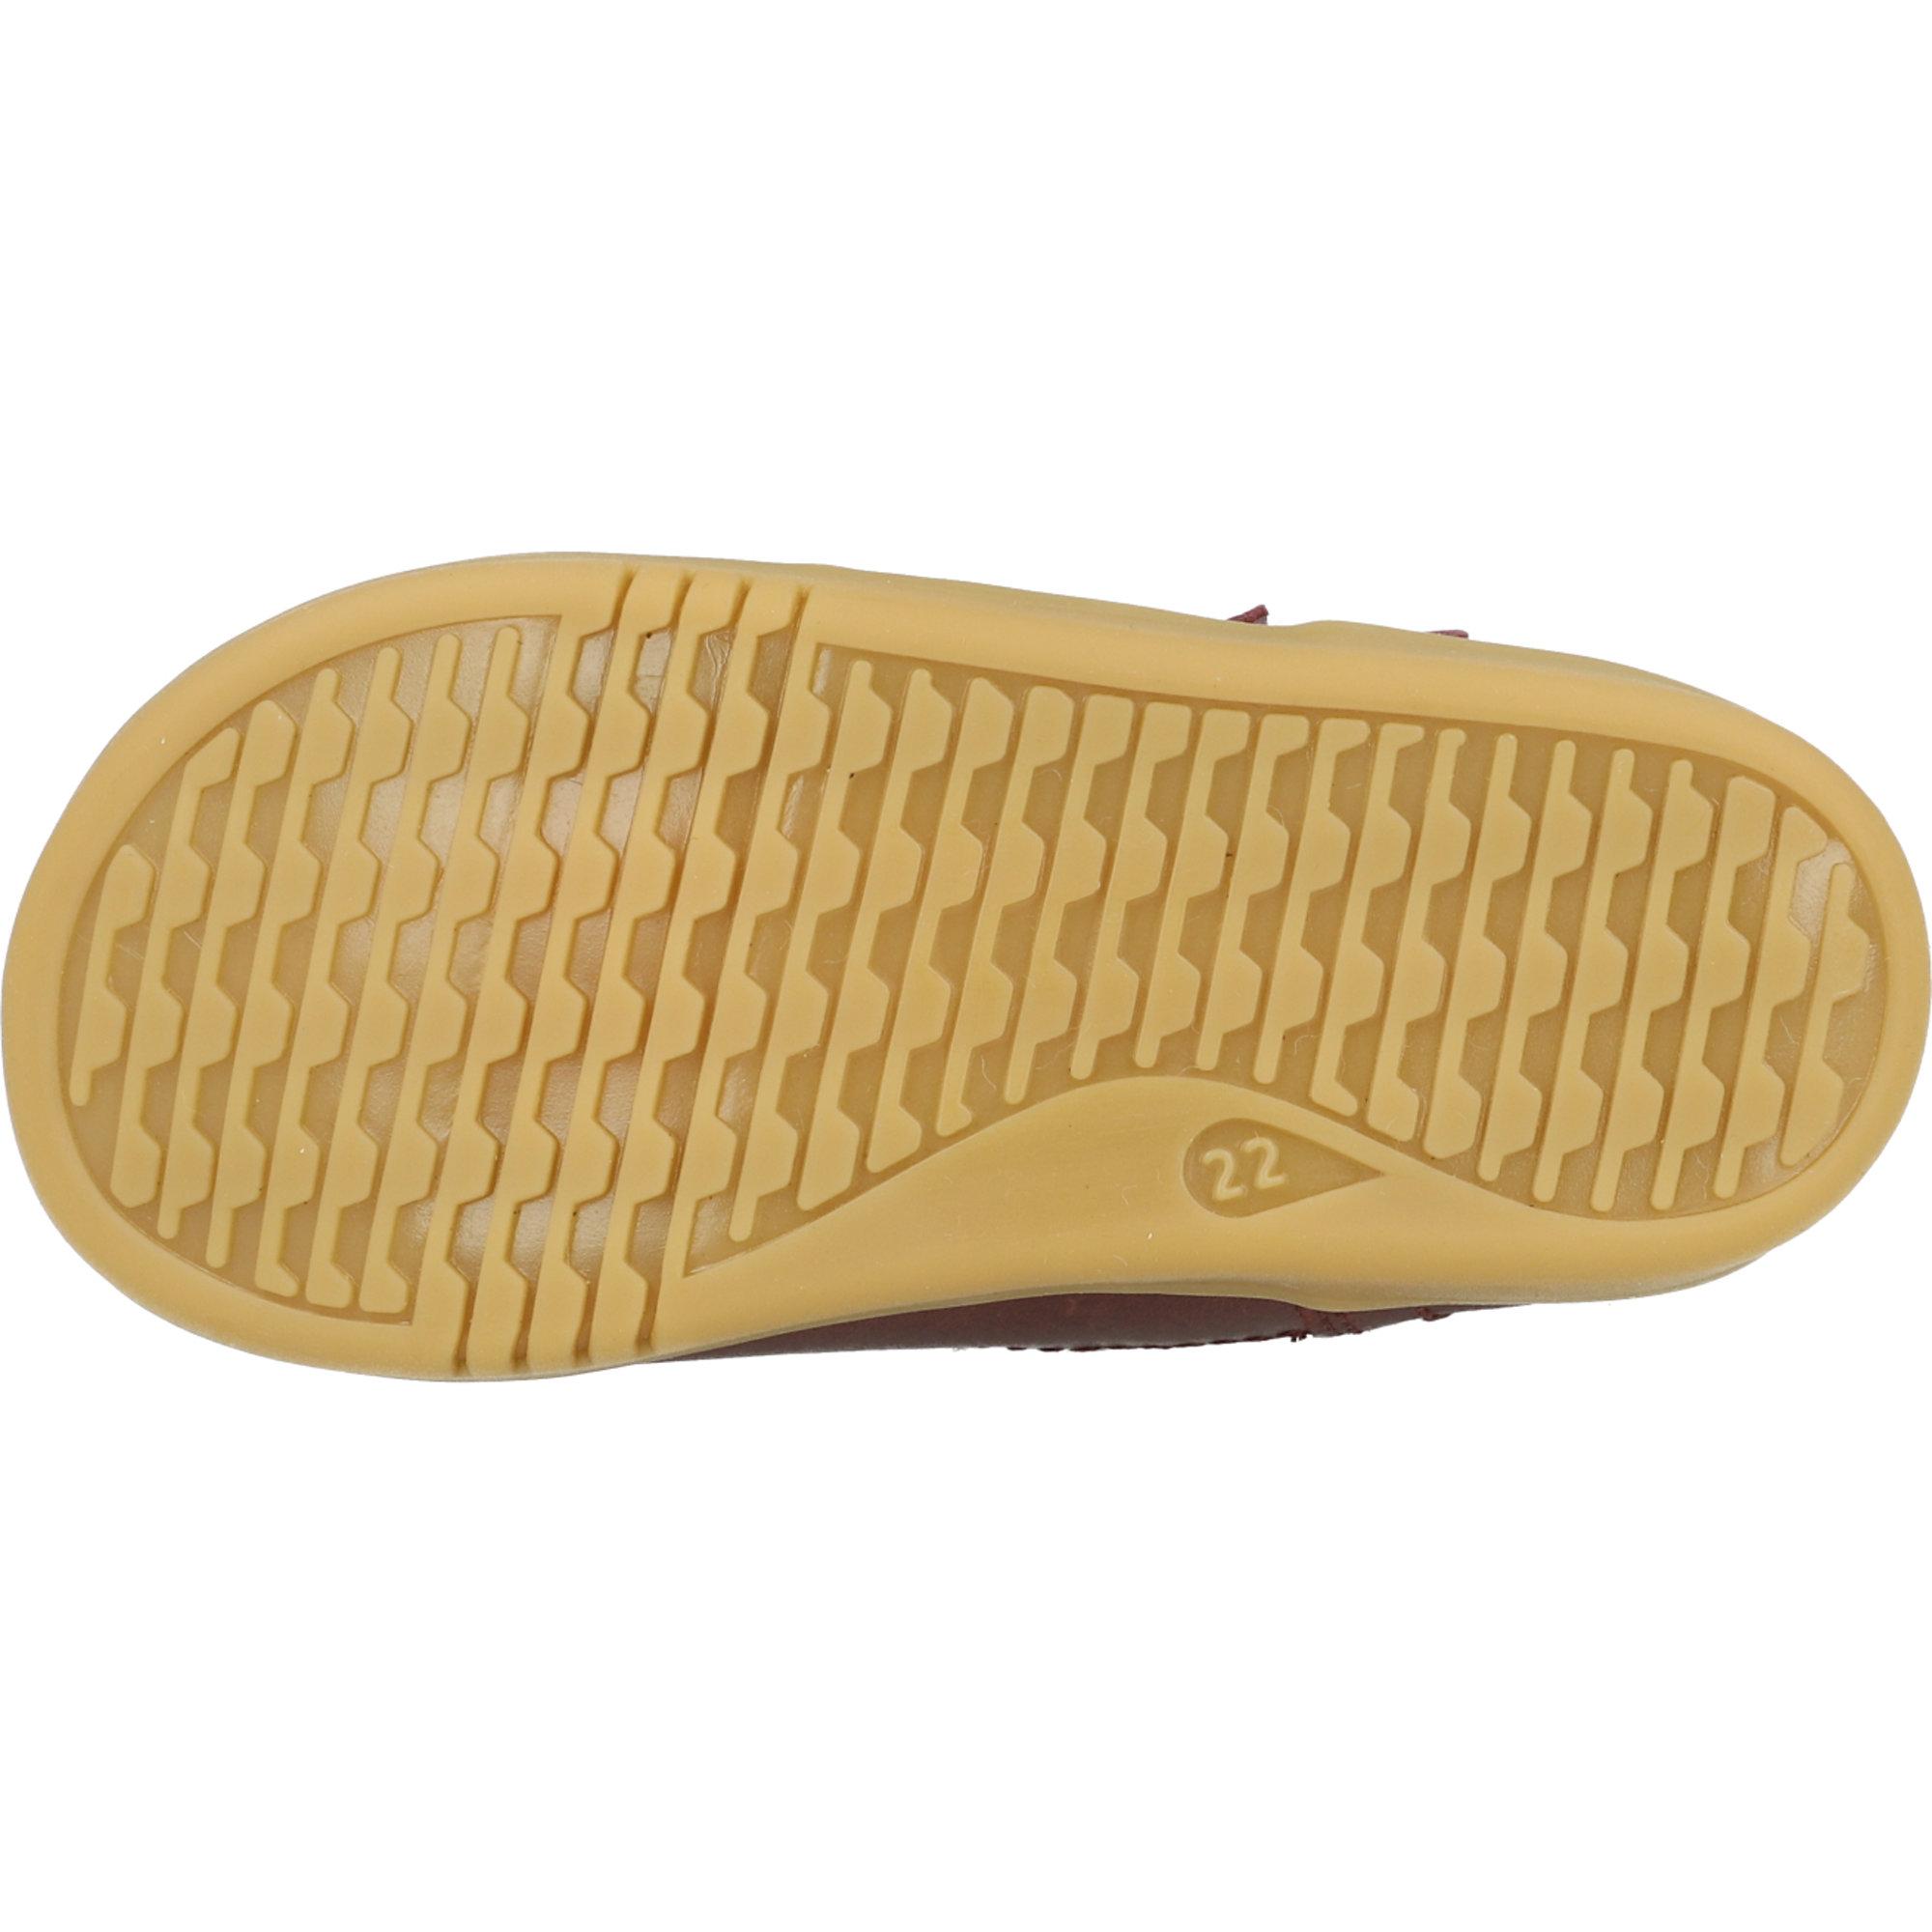 Bobux i-Walk Aspen Plum Leather